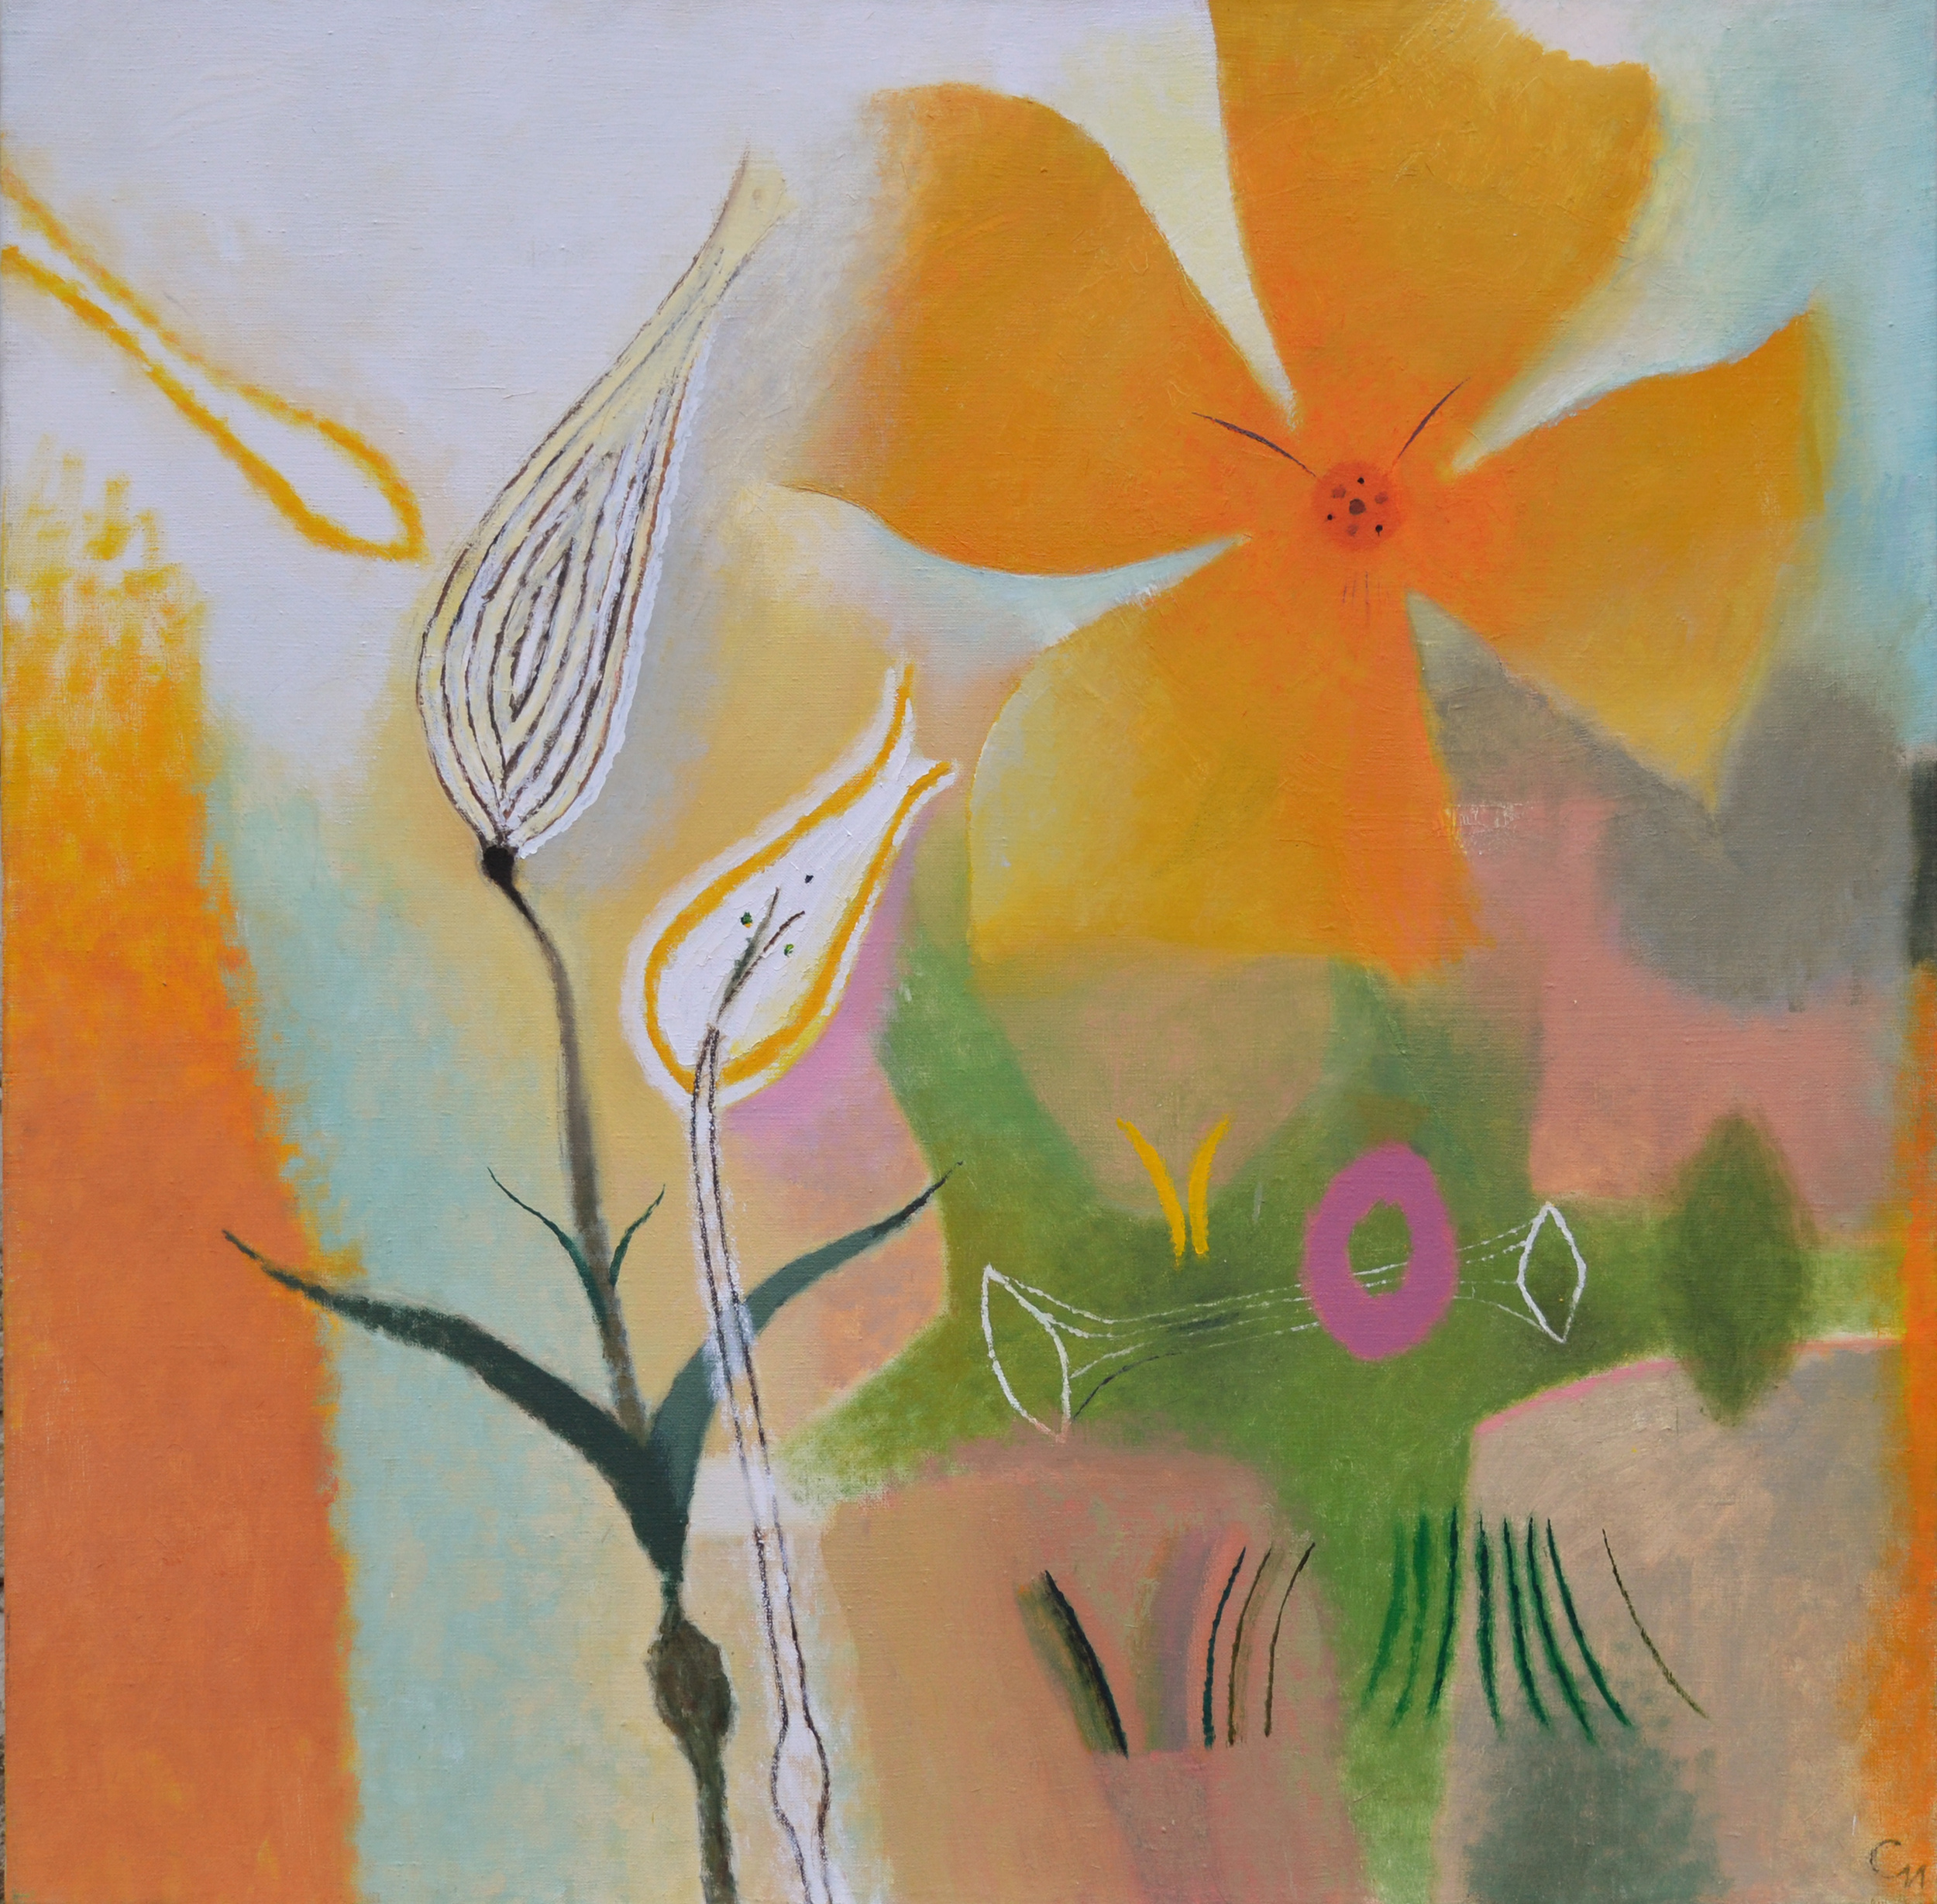 "Flowers, 2014, Oil on Canvas, 36"" x 36"" (90х90 cm)"